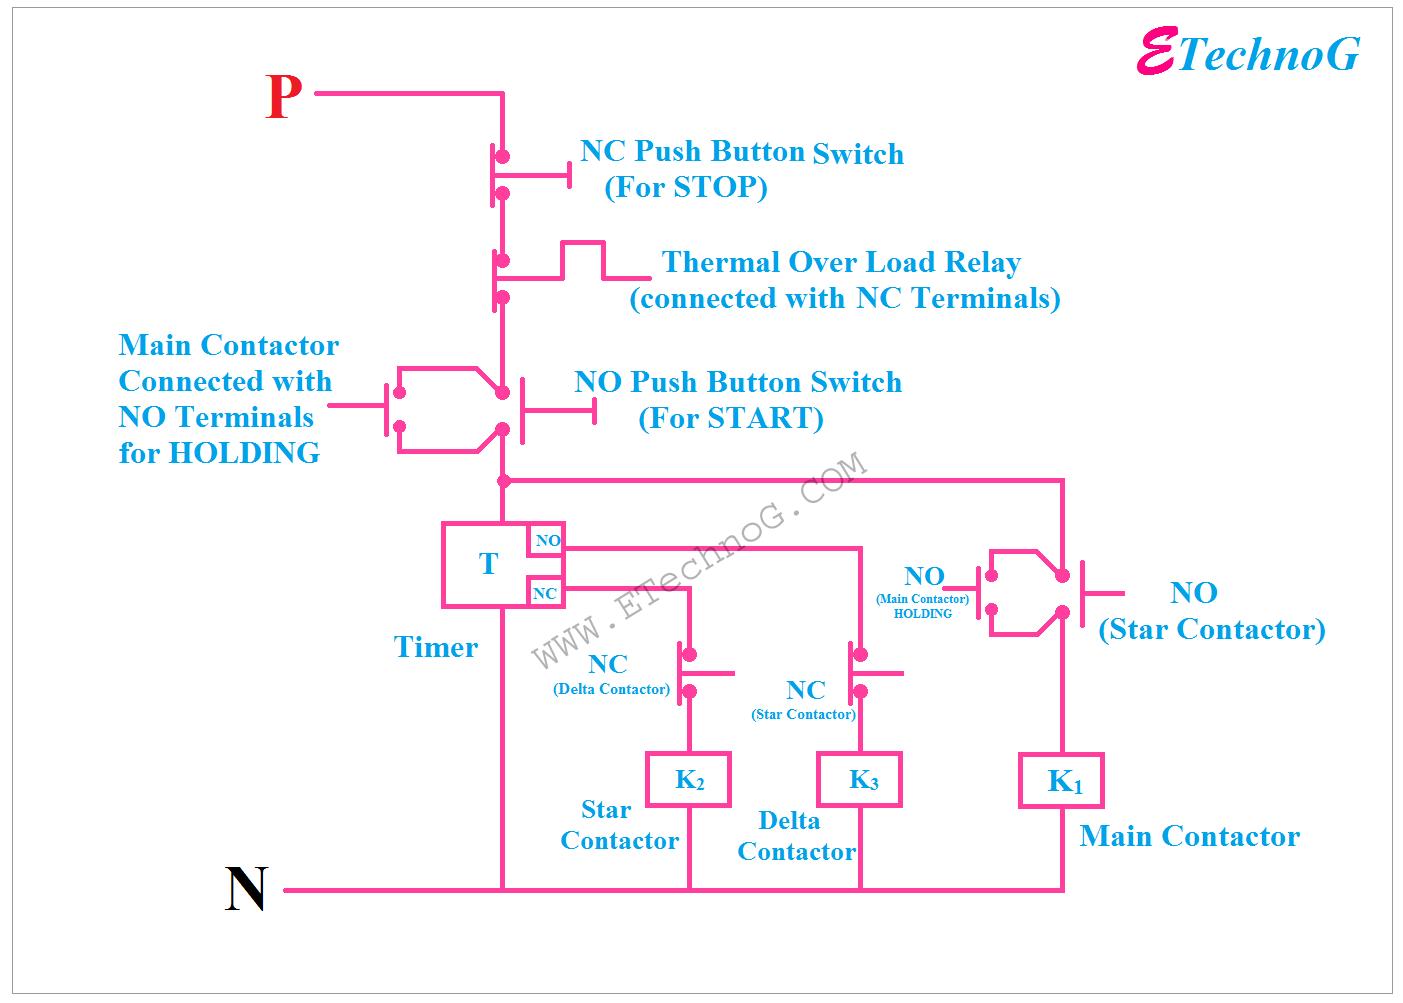 [SCHEMATICS_48EU]  Explained] Star Delta Starter Diagram | Control and Power Circuit - ETechnoG | Wiring Diagram Star Delta Starter |  | ETechnoG